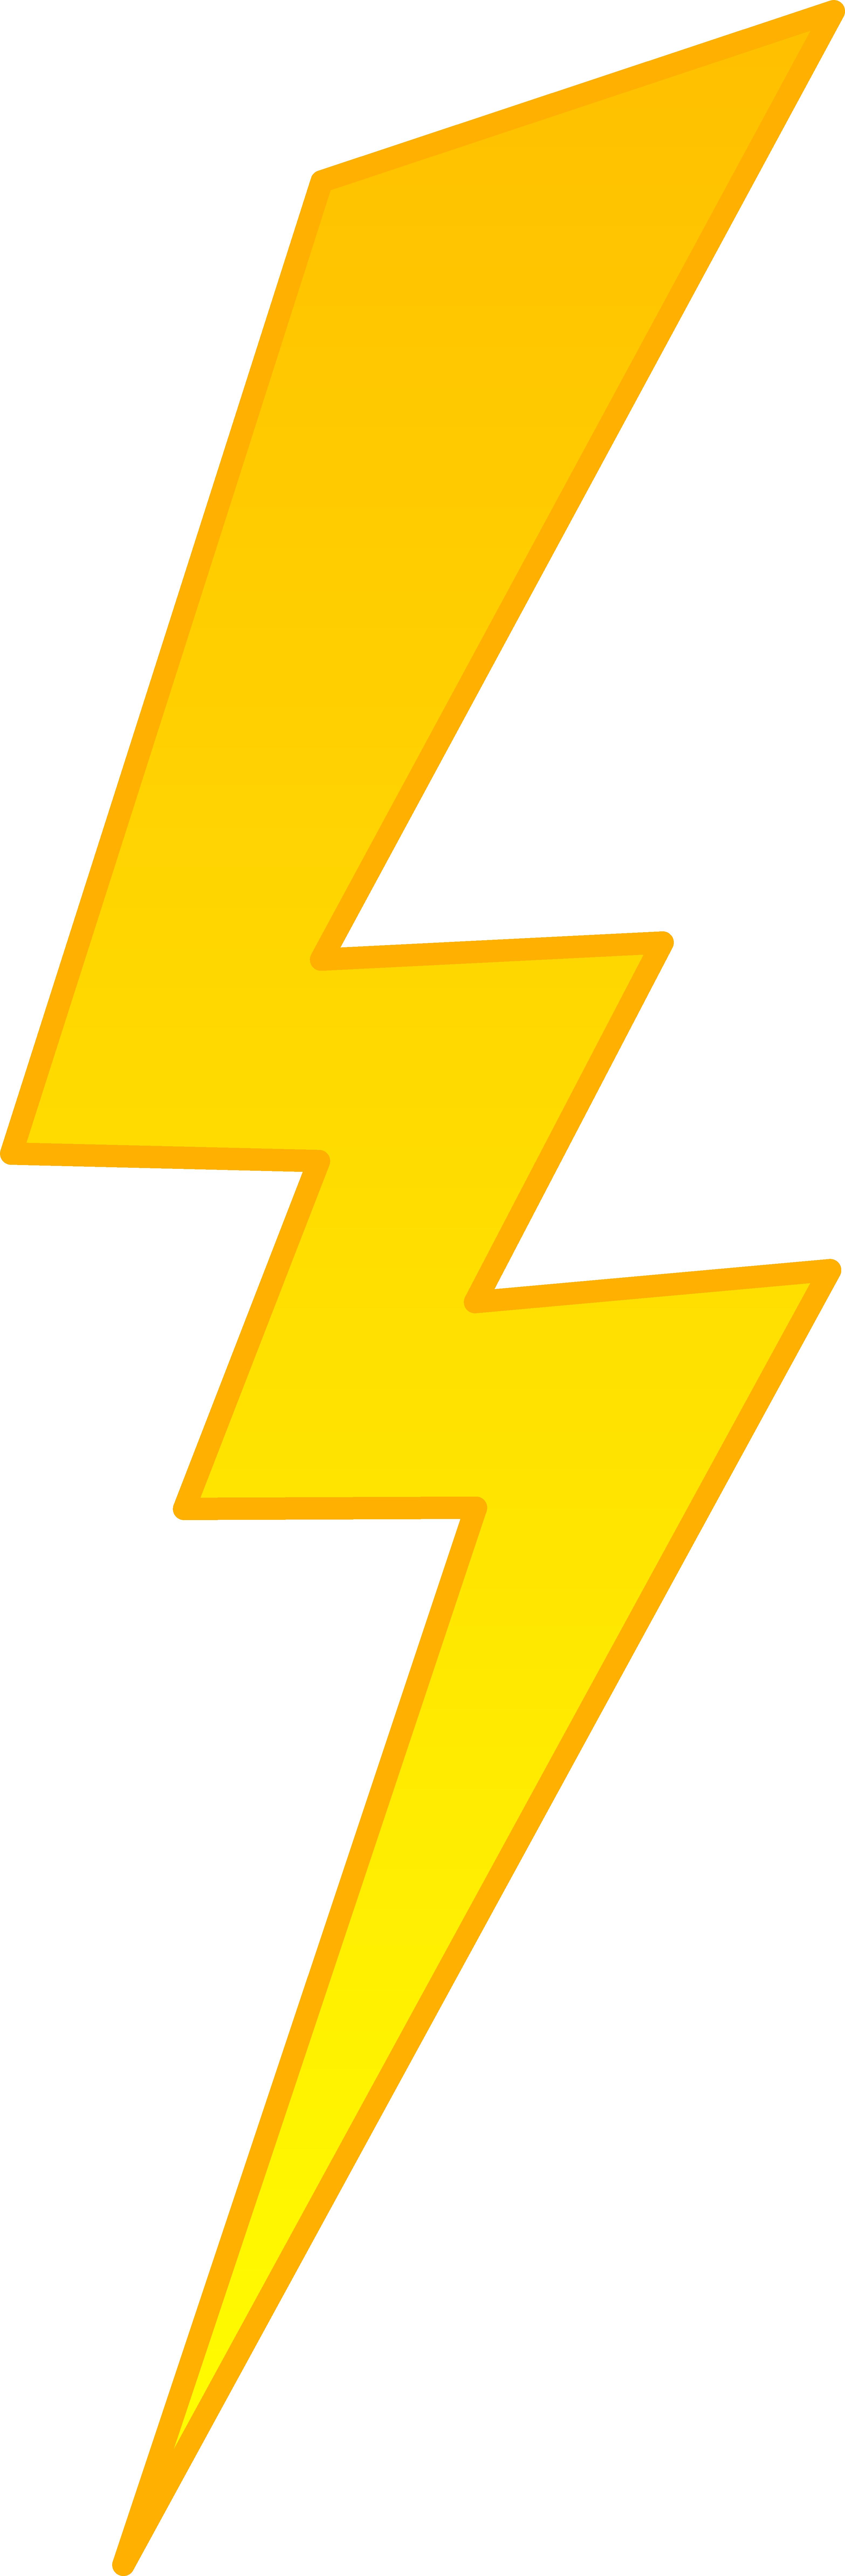 Lightning clipart transparent background picture black and white download HD Golden Lightning Bolt Symbol Free Download - Lightning Clipart ... picture black and white download